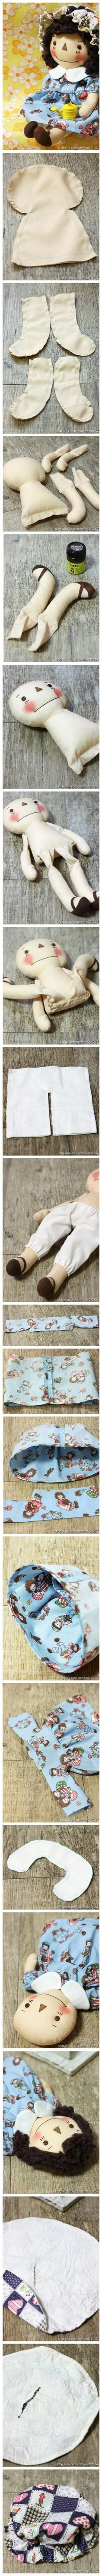 lalaloopsy free sewing pattern side 1 dolls u0026 softies u0026 plushies